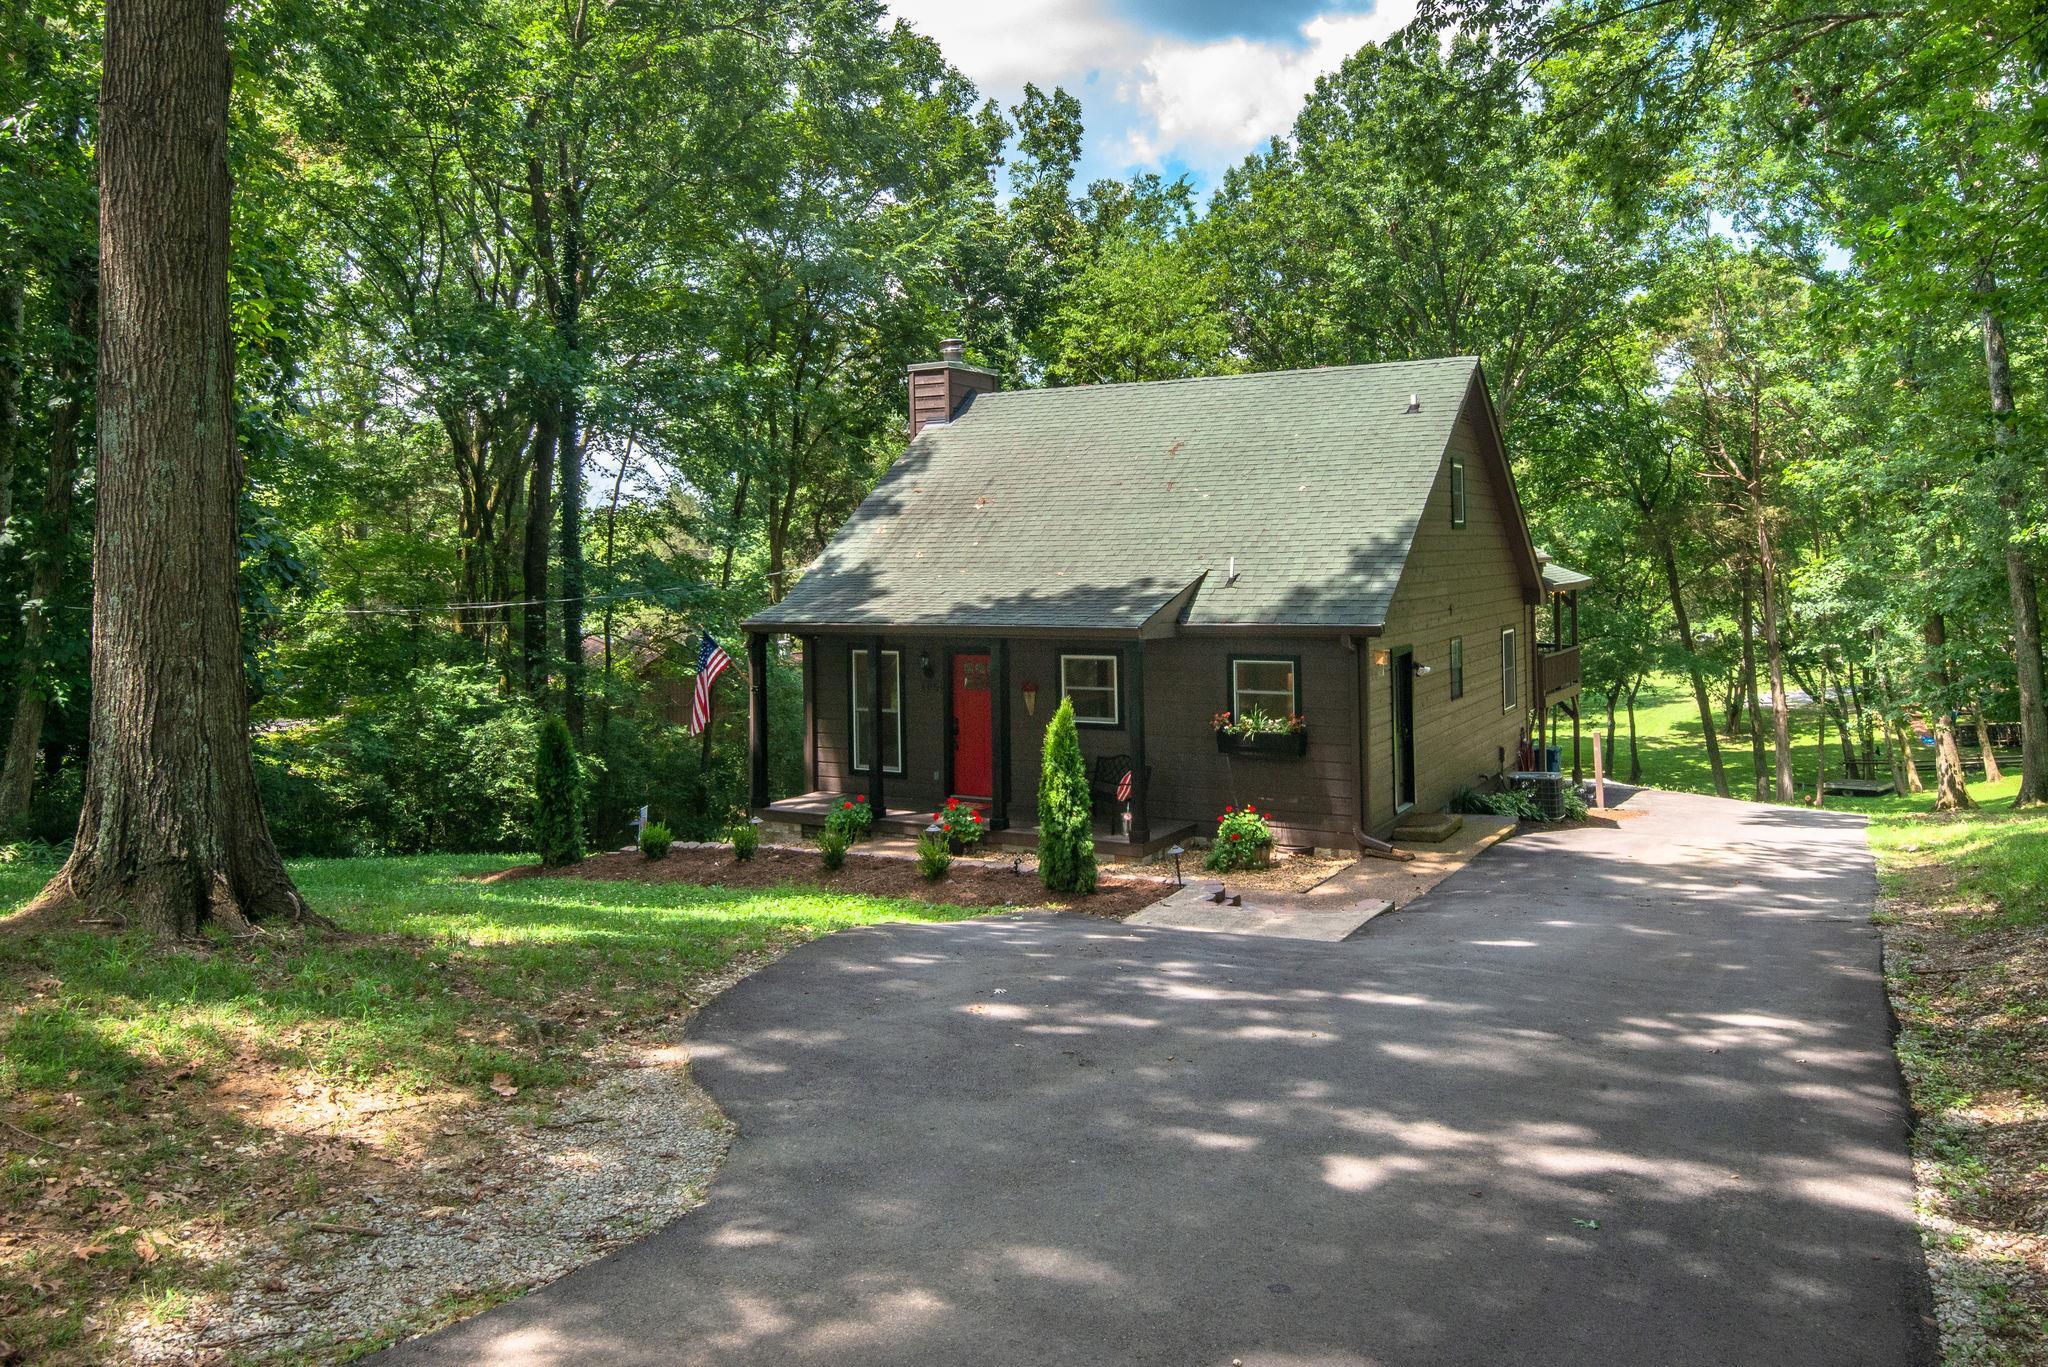 105 Sunset Island Trl, Gallatin, TN 37066 - Gallatin, TN real estate listing